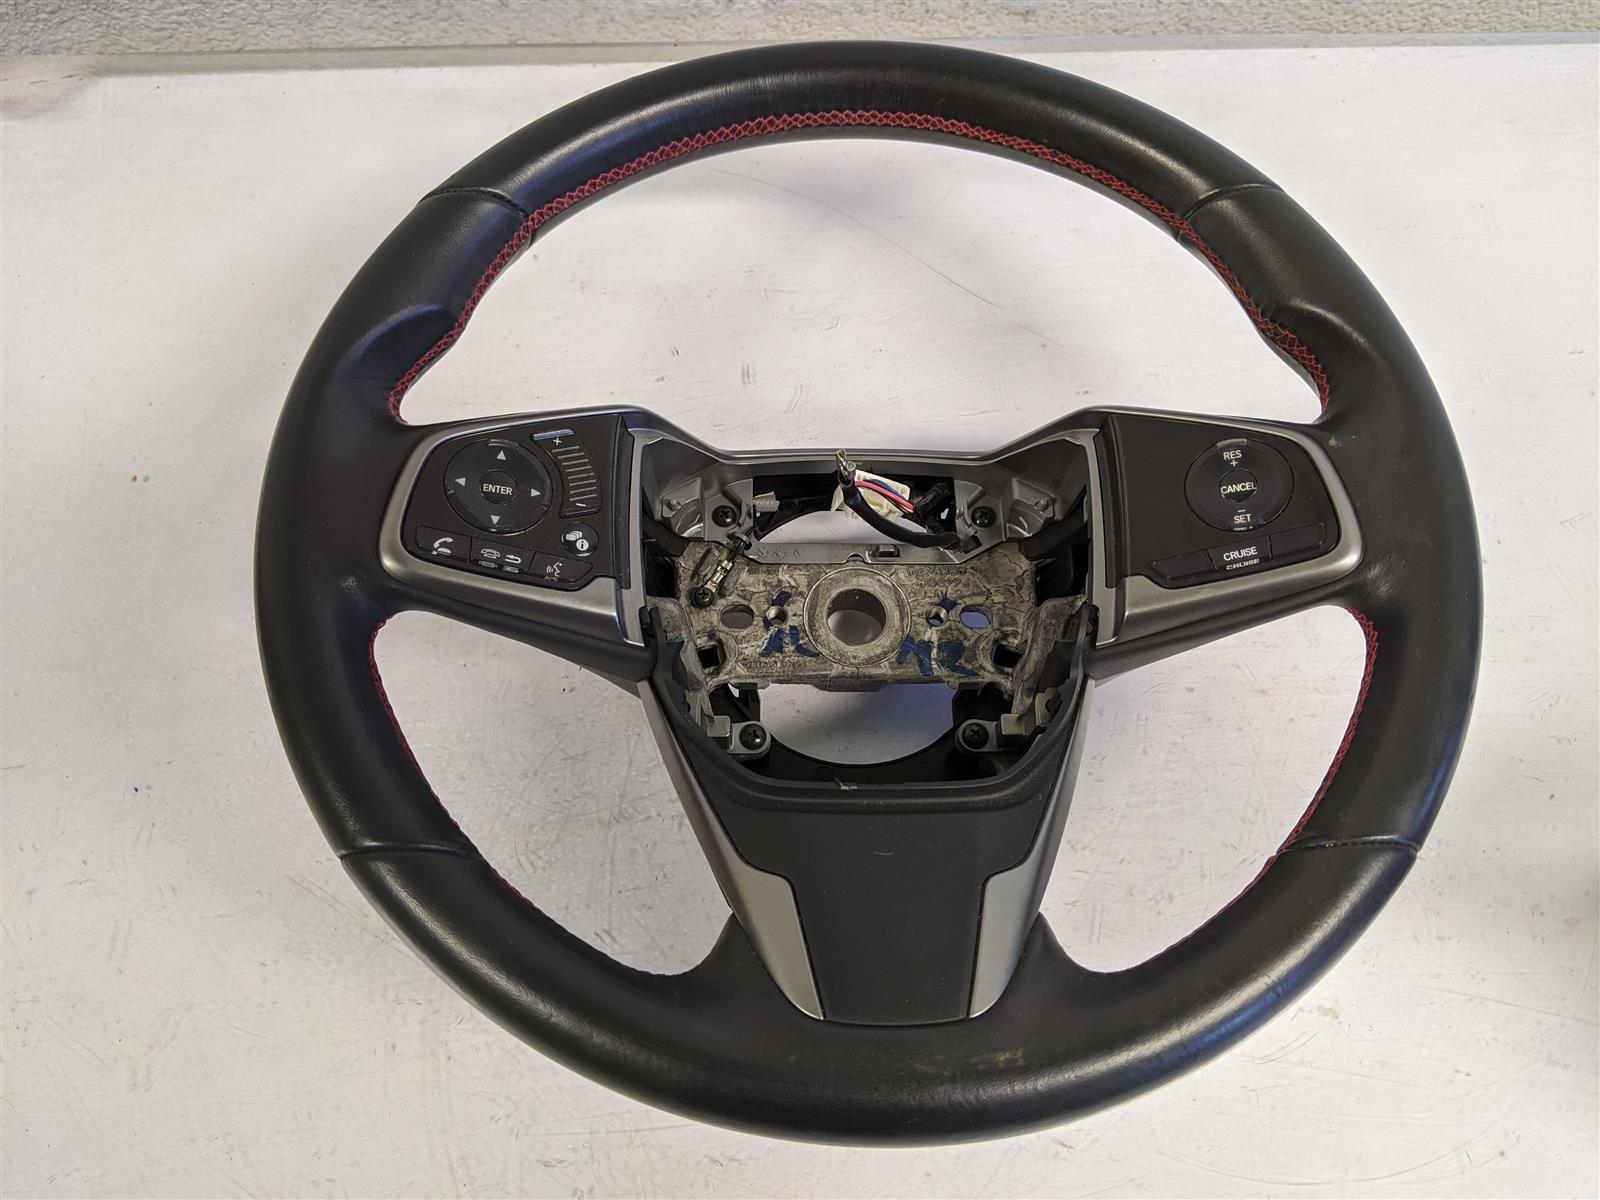 2018 Honda Civic Steering Wheel Black Replacement